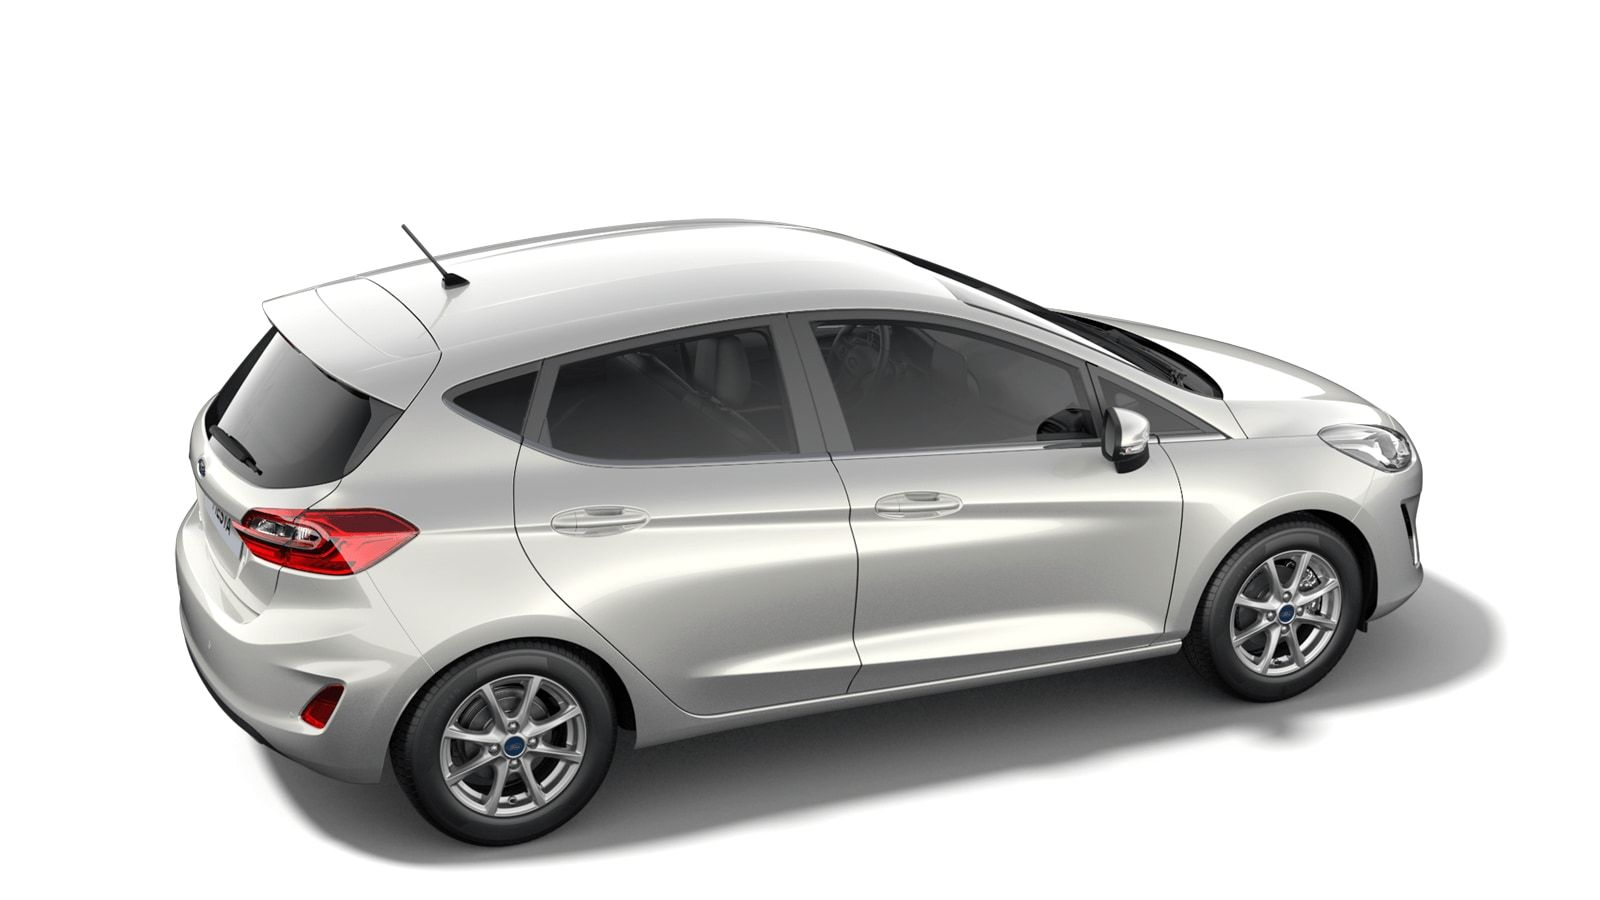 "Nieuw Ford All-new ford fiesta Connected 1.0i EcoBoost 95pk / 70kW M6 - 5d JKV - Speciale metaalkleur ""Metropolis White"" 2"